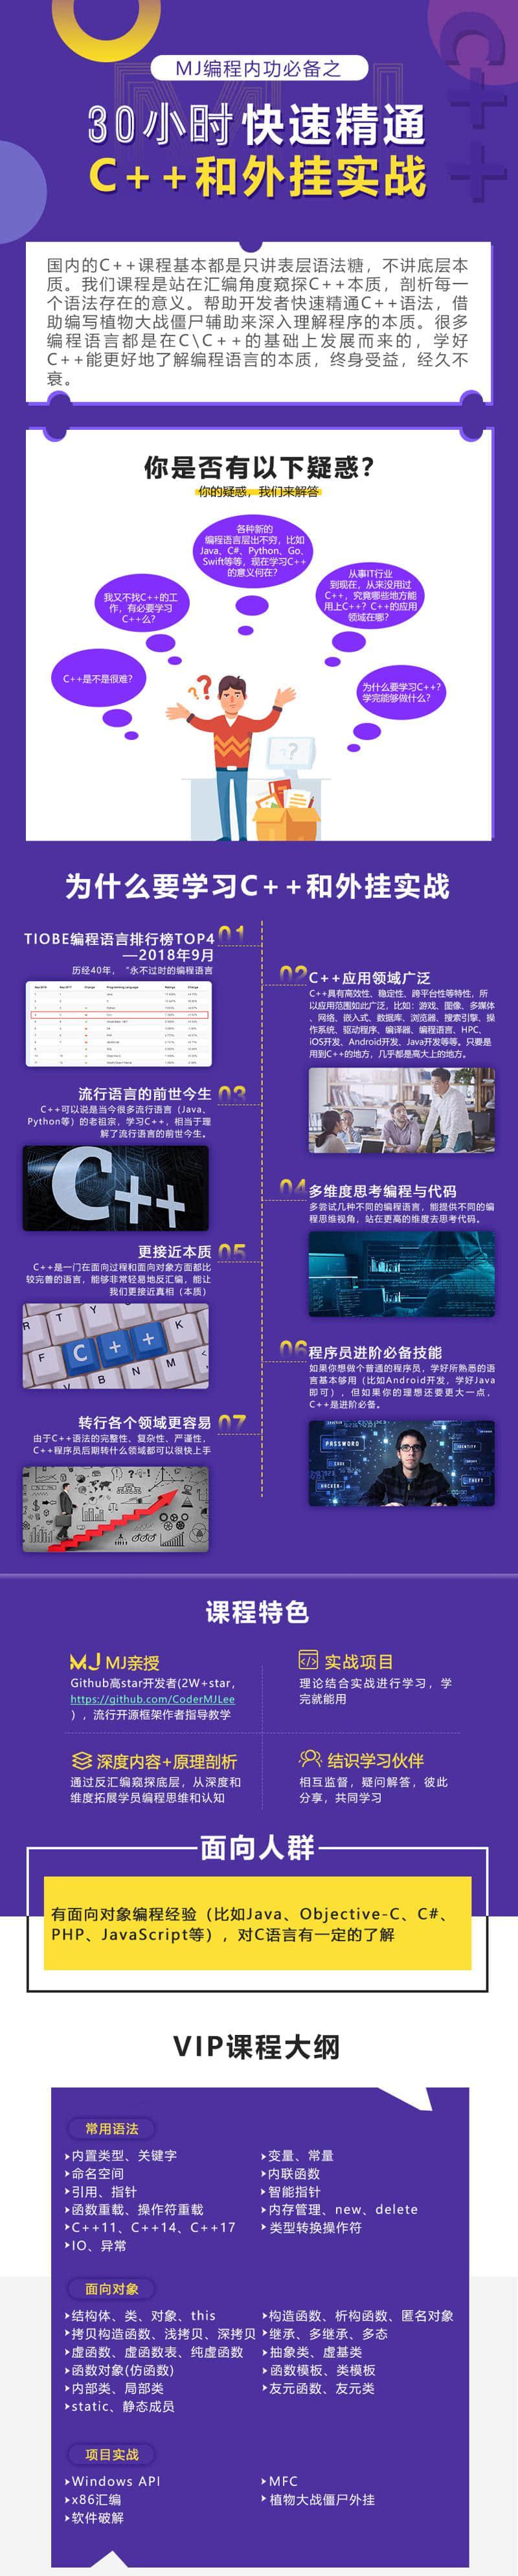 MJ编程内功必备之30小时快速精通C++和WG实战2